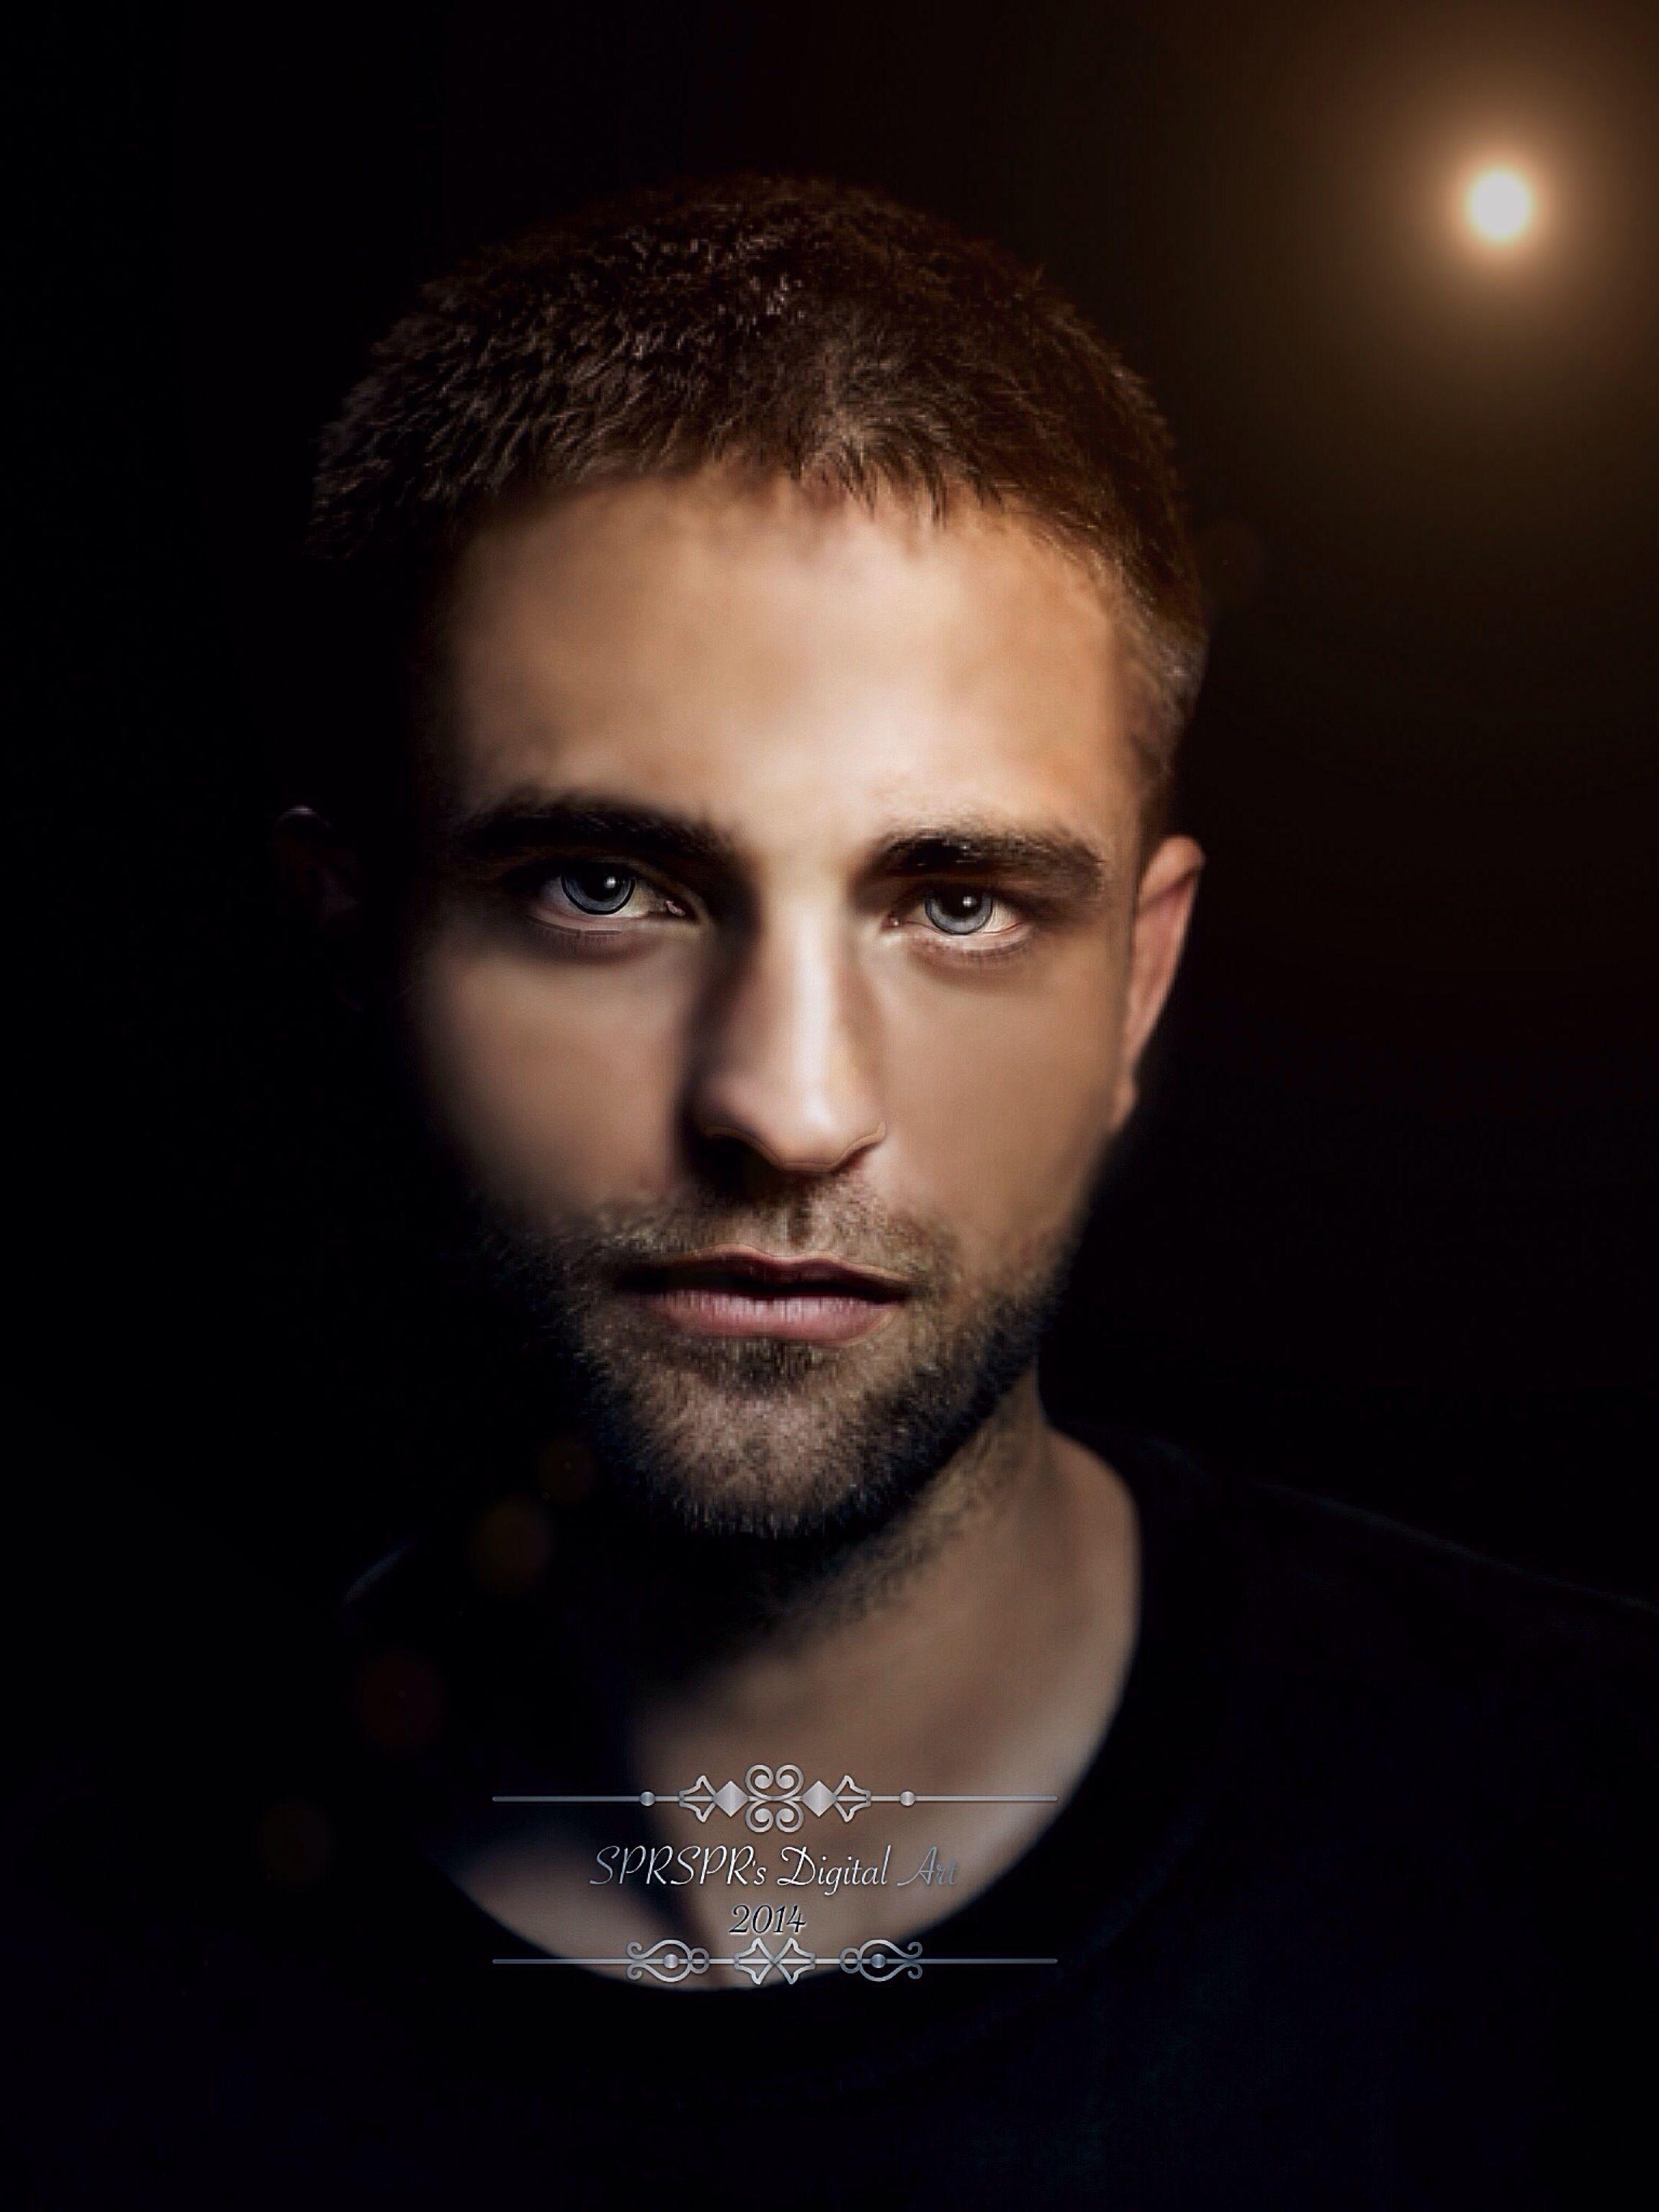 Robert Pattinson dating leven mijn vreemde verslaving man dating auto